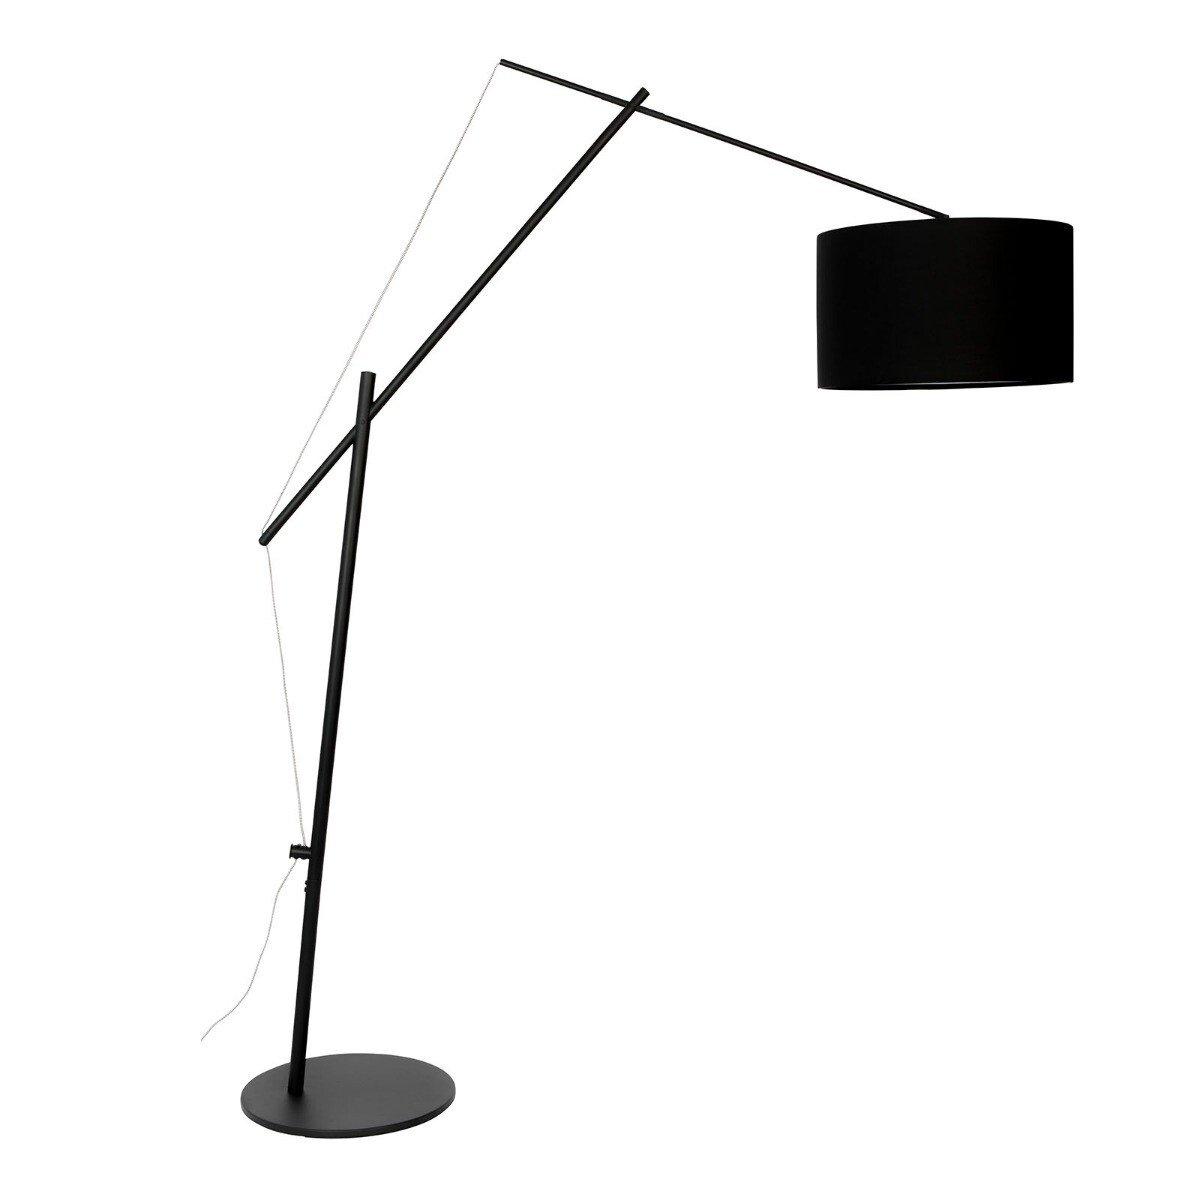 Wants&Needs vloerlamp Tokio zwart 210 x 50 x 168